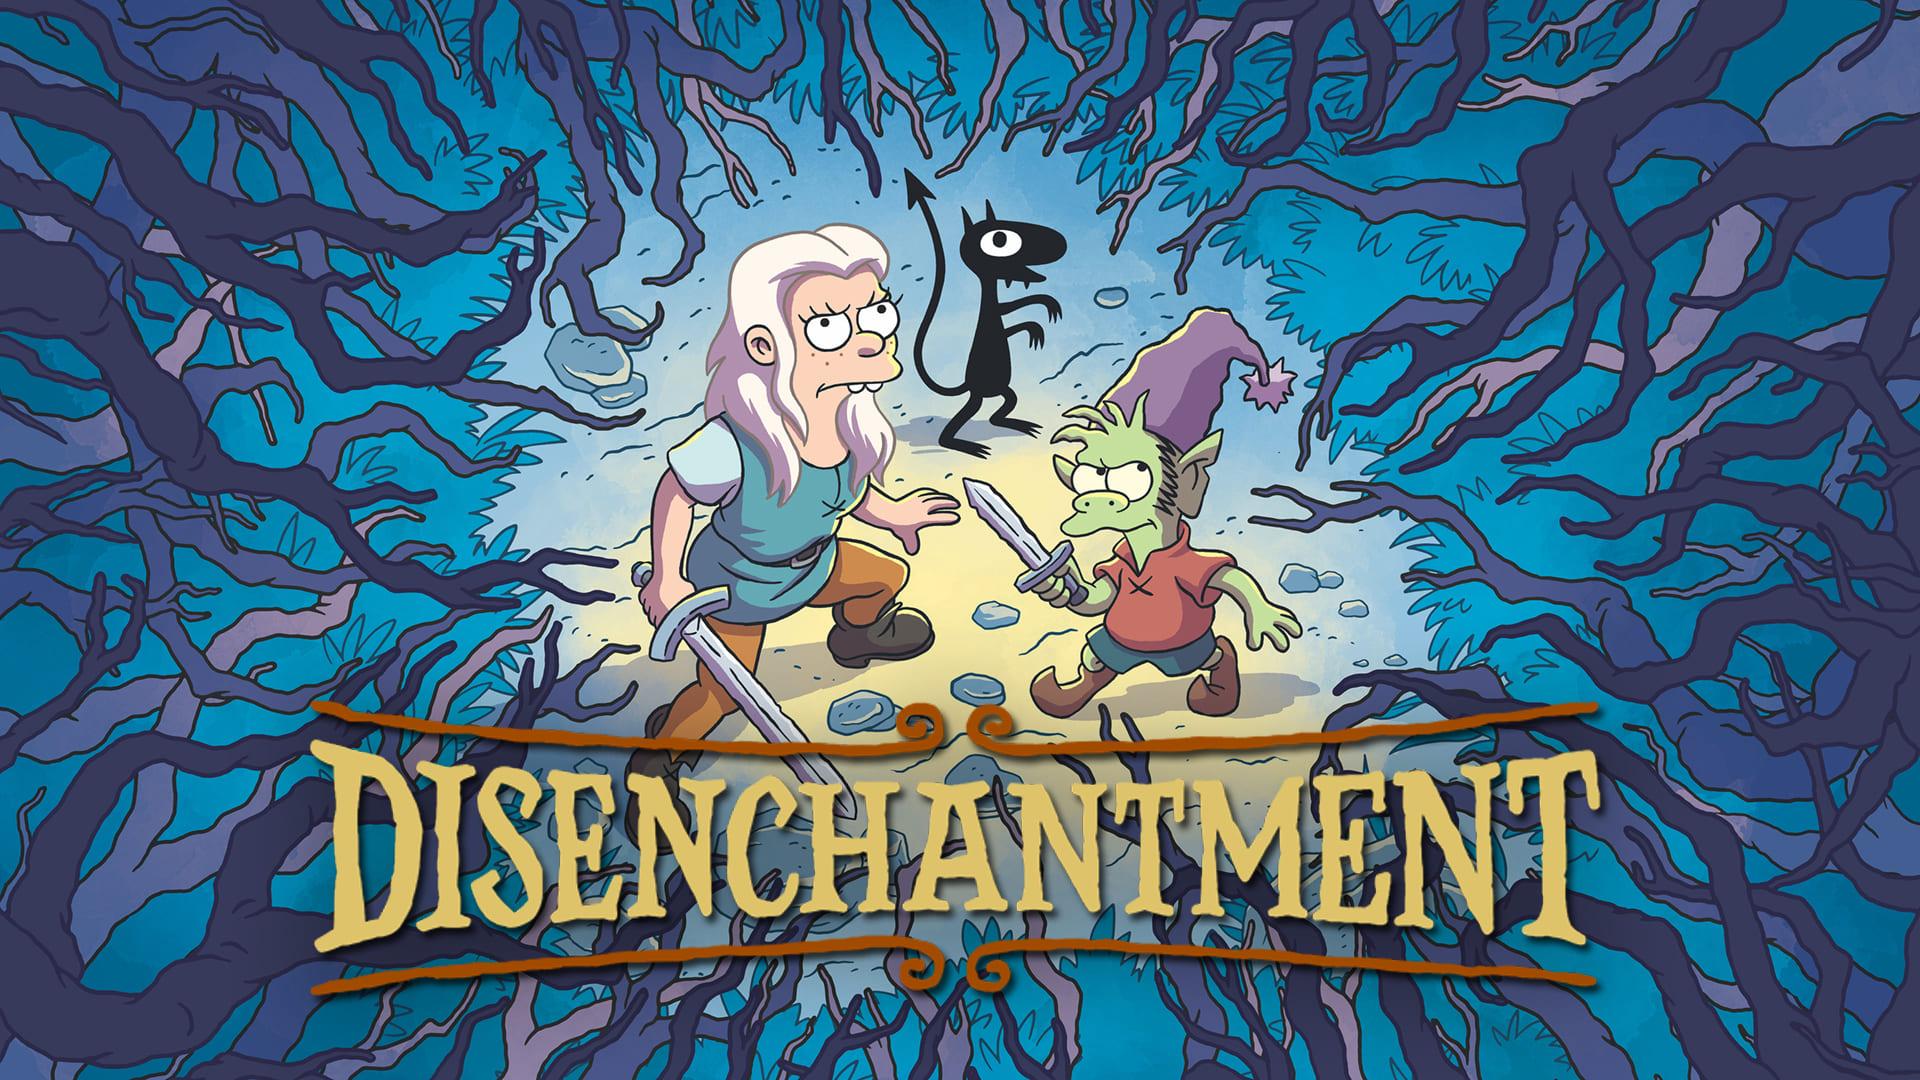 Disenchantment